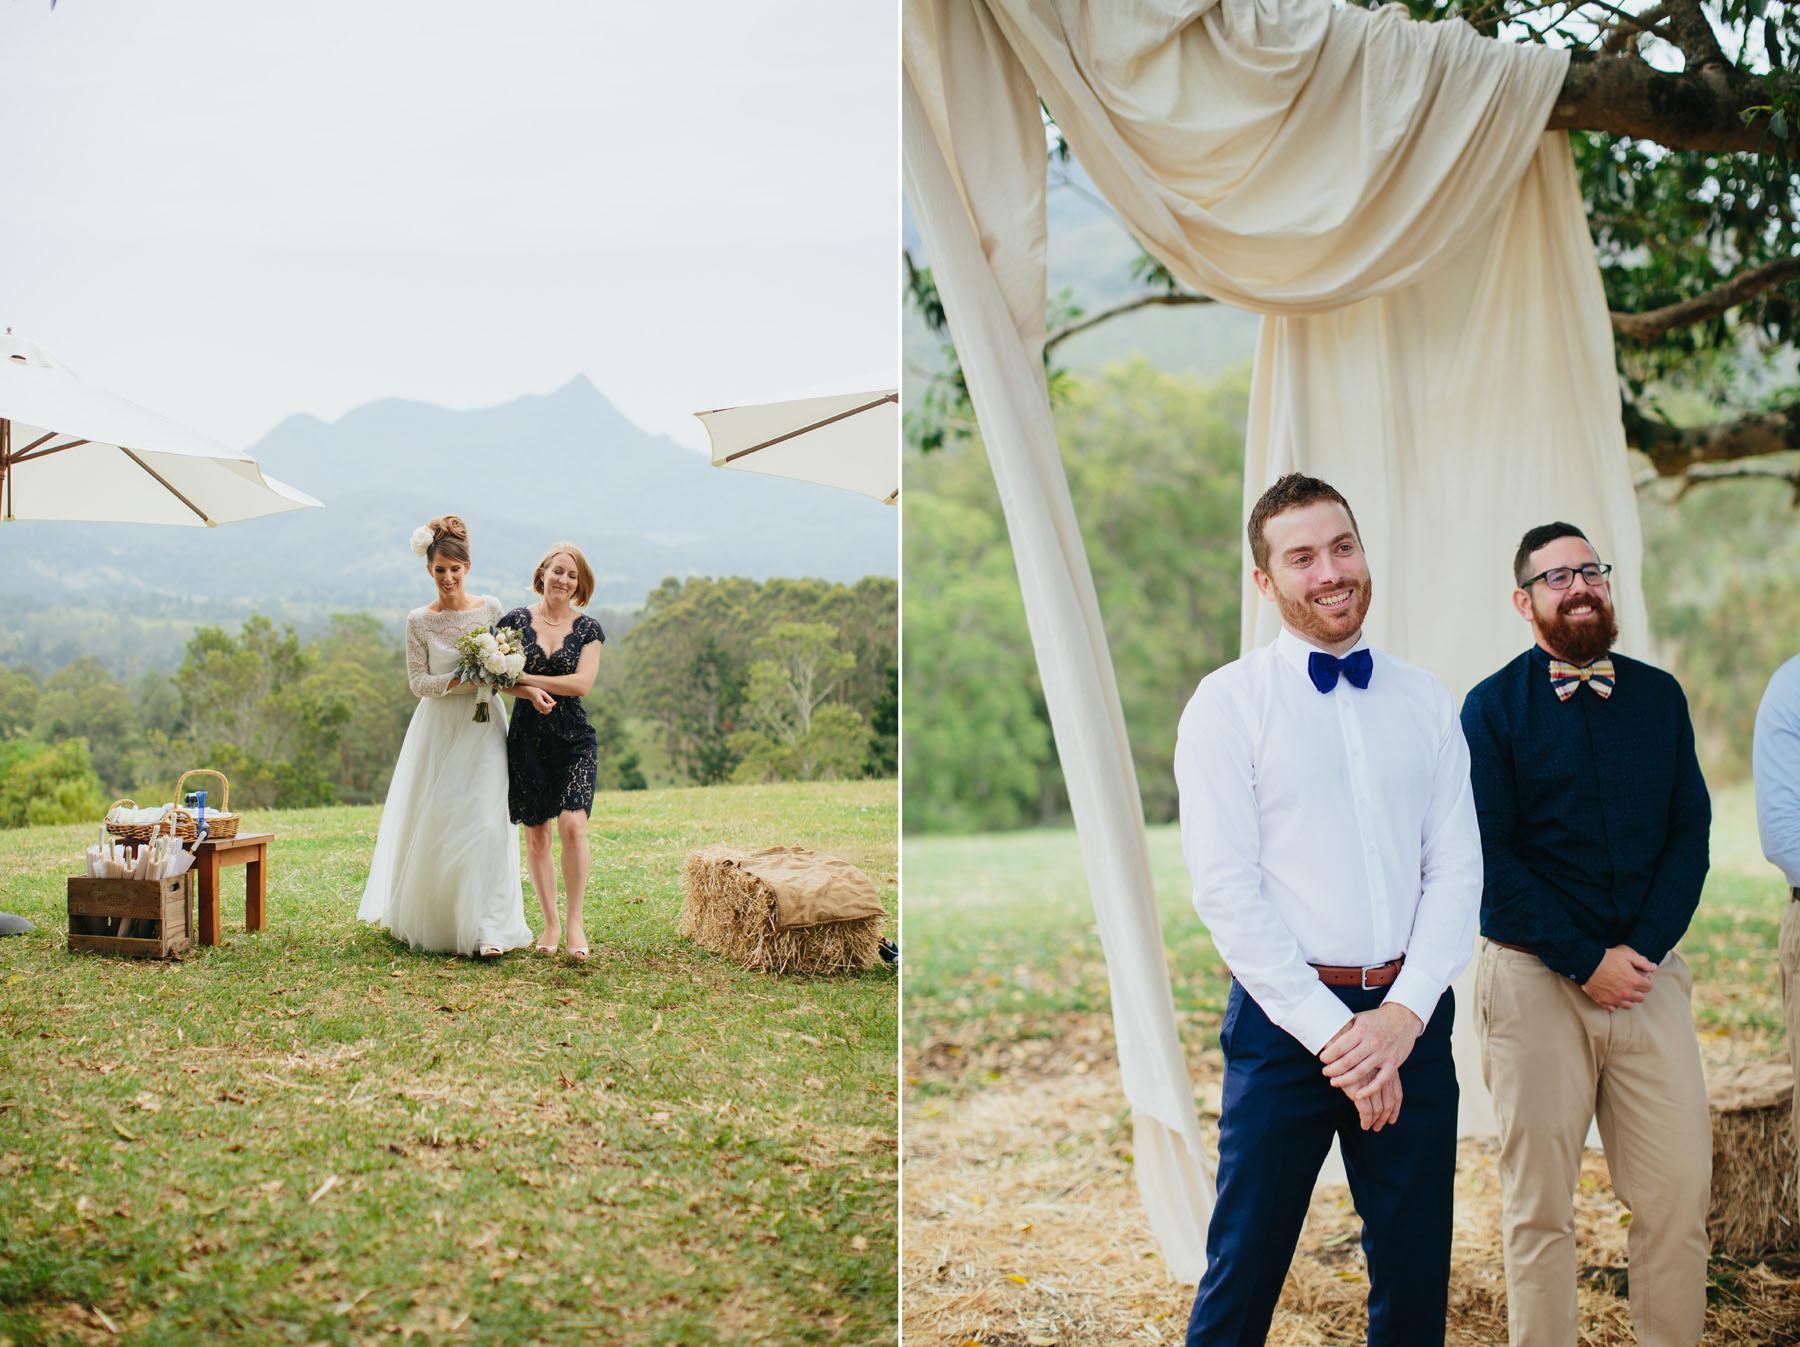 03_midginbill hill wedding .jpg